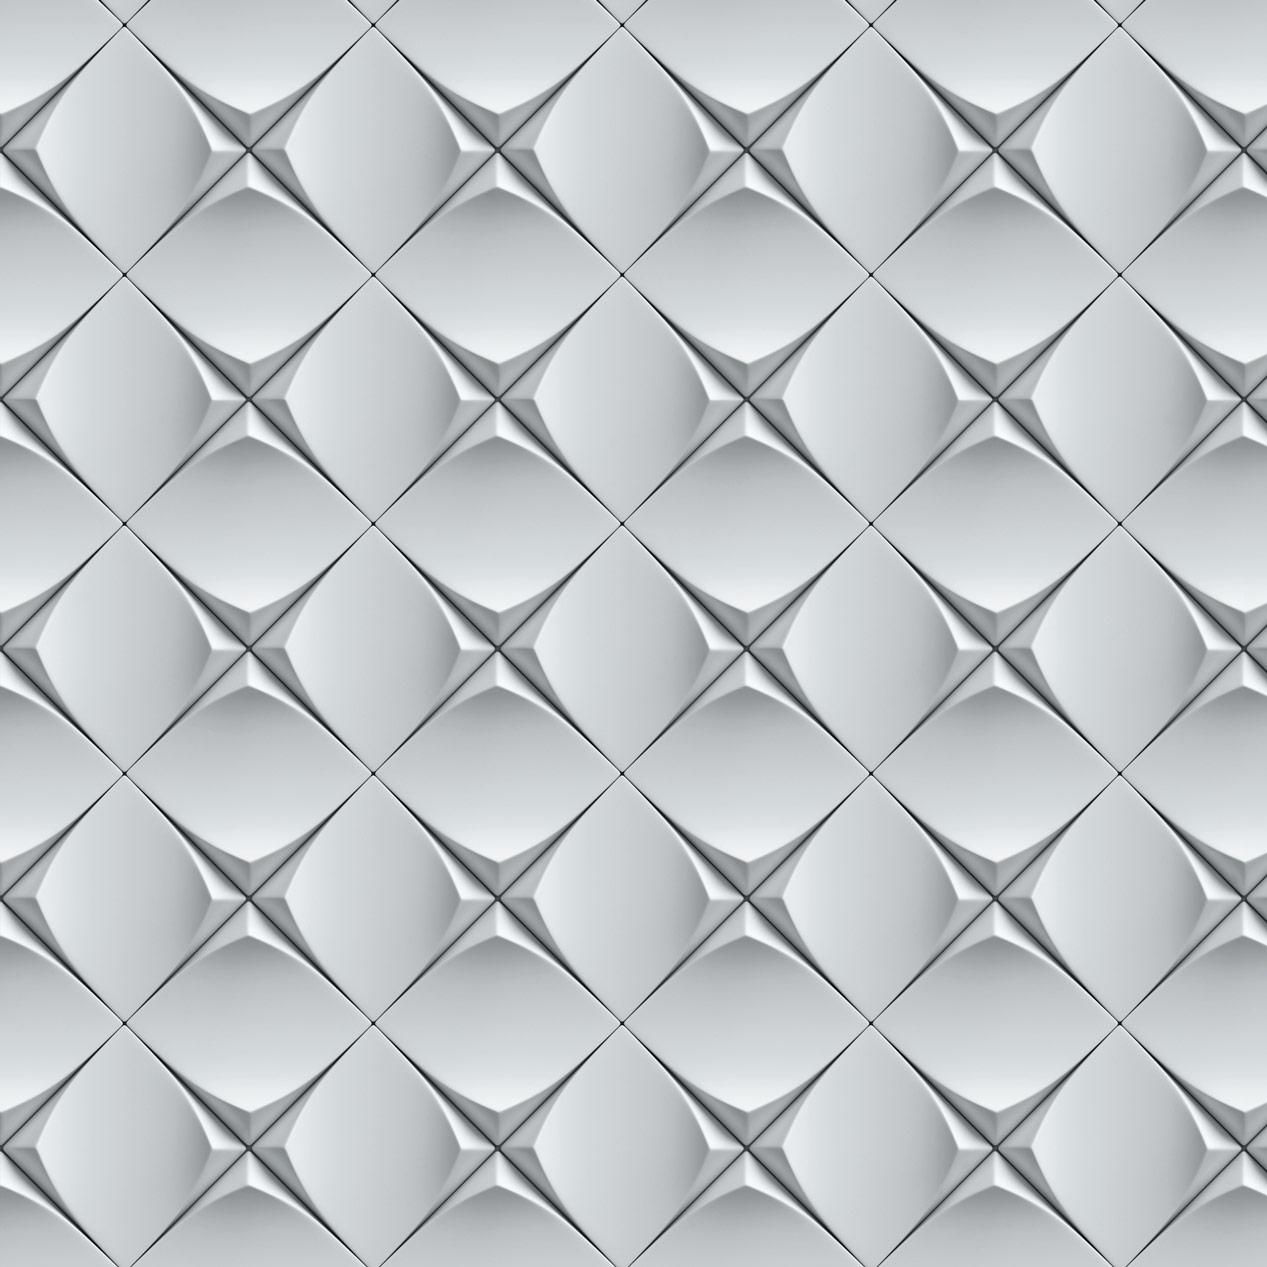 Papel de Parede Geométrico Estilo 3D Efeito Metal